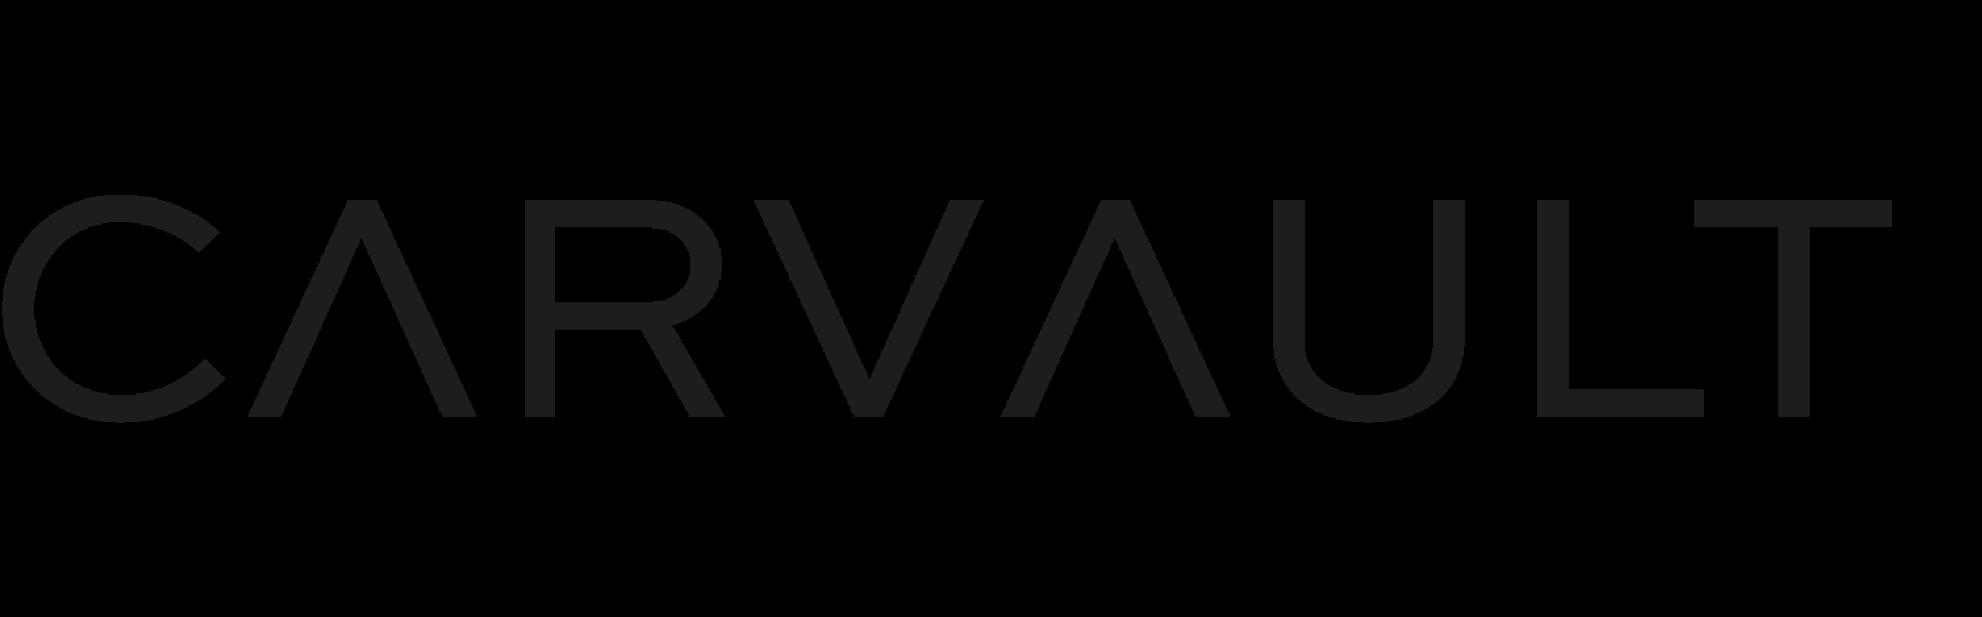 CARVAULT